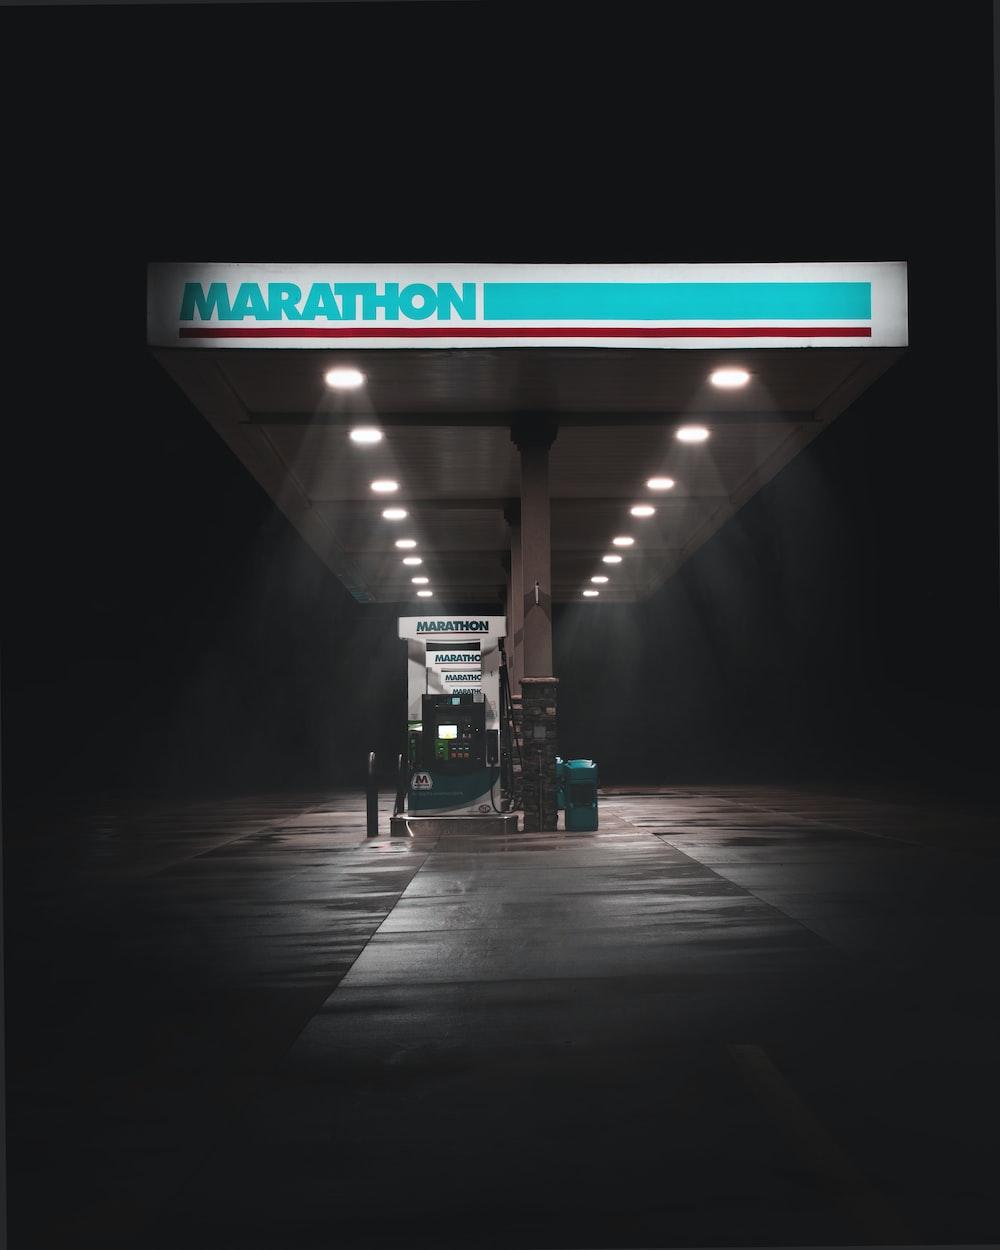 lighted Marathon gas station